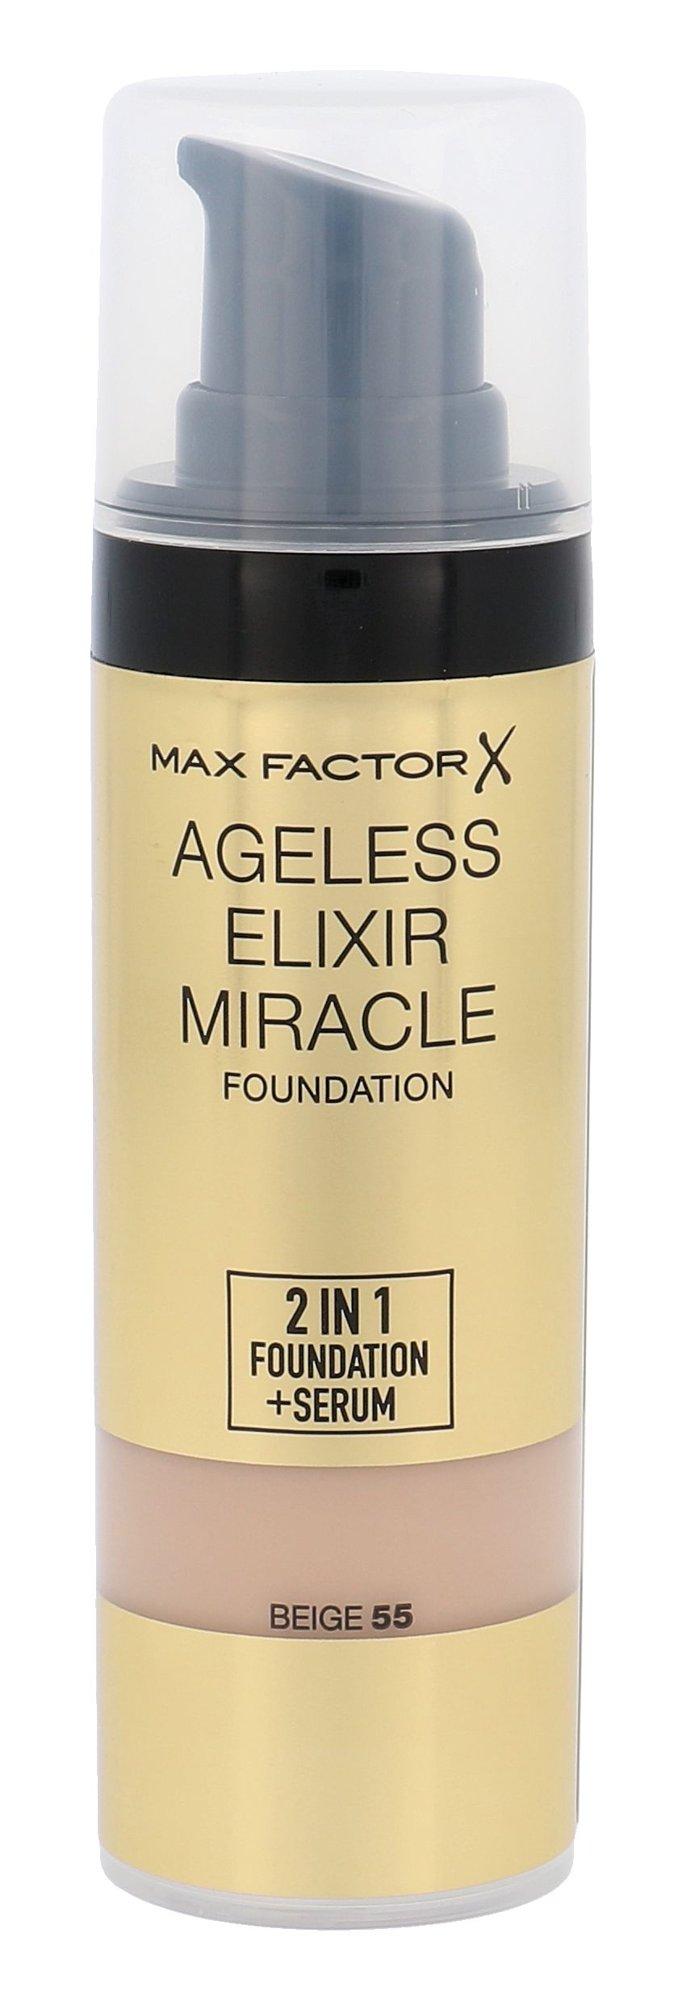 Kreminė pudra Max Factor Ageless Elixir 2v1 Foundation + Serum SPF15